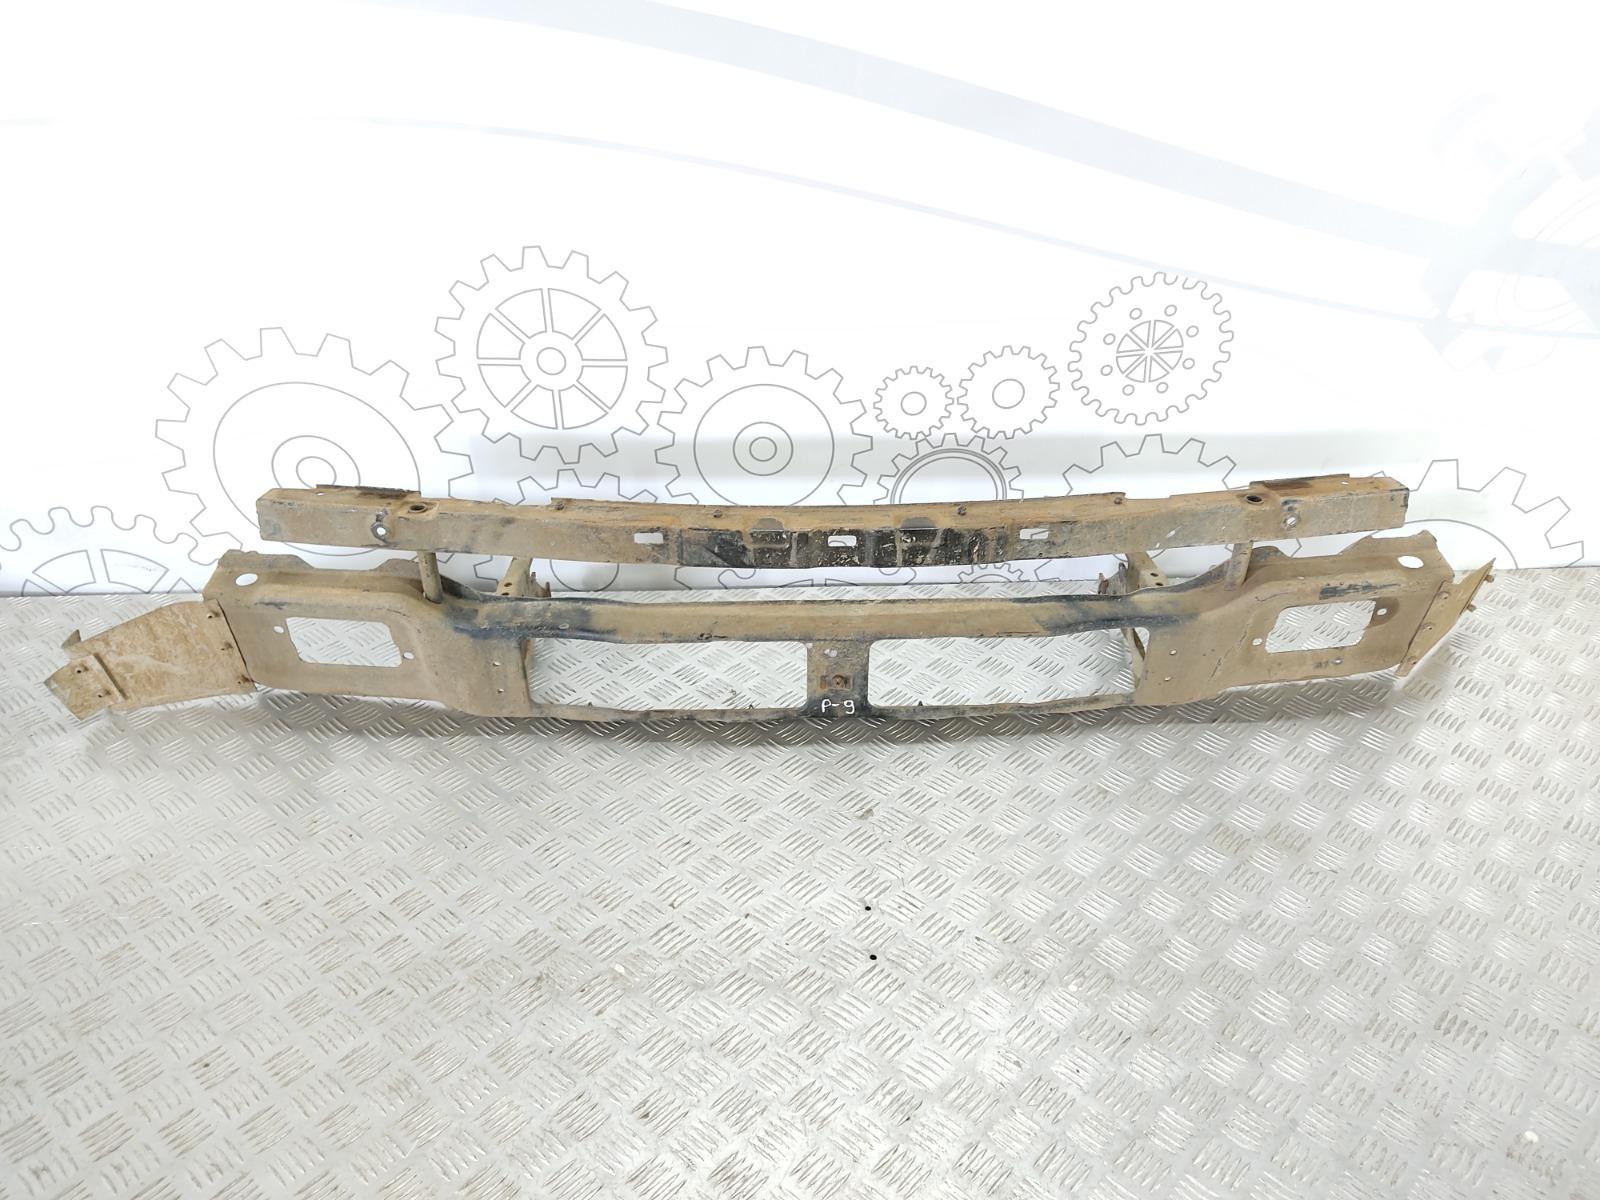 Усилитель бампера переднего Nissan Terrano 3.0 DI 2003 (б/у)